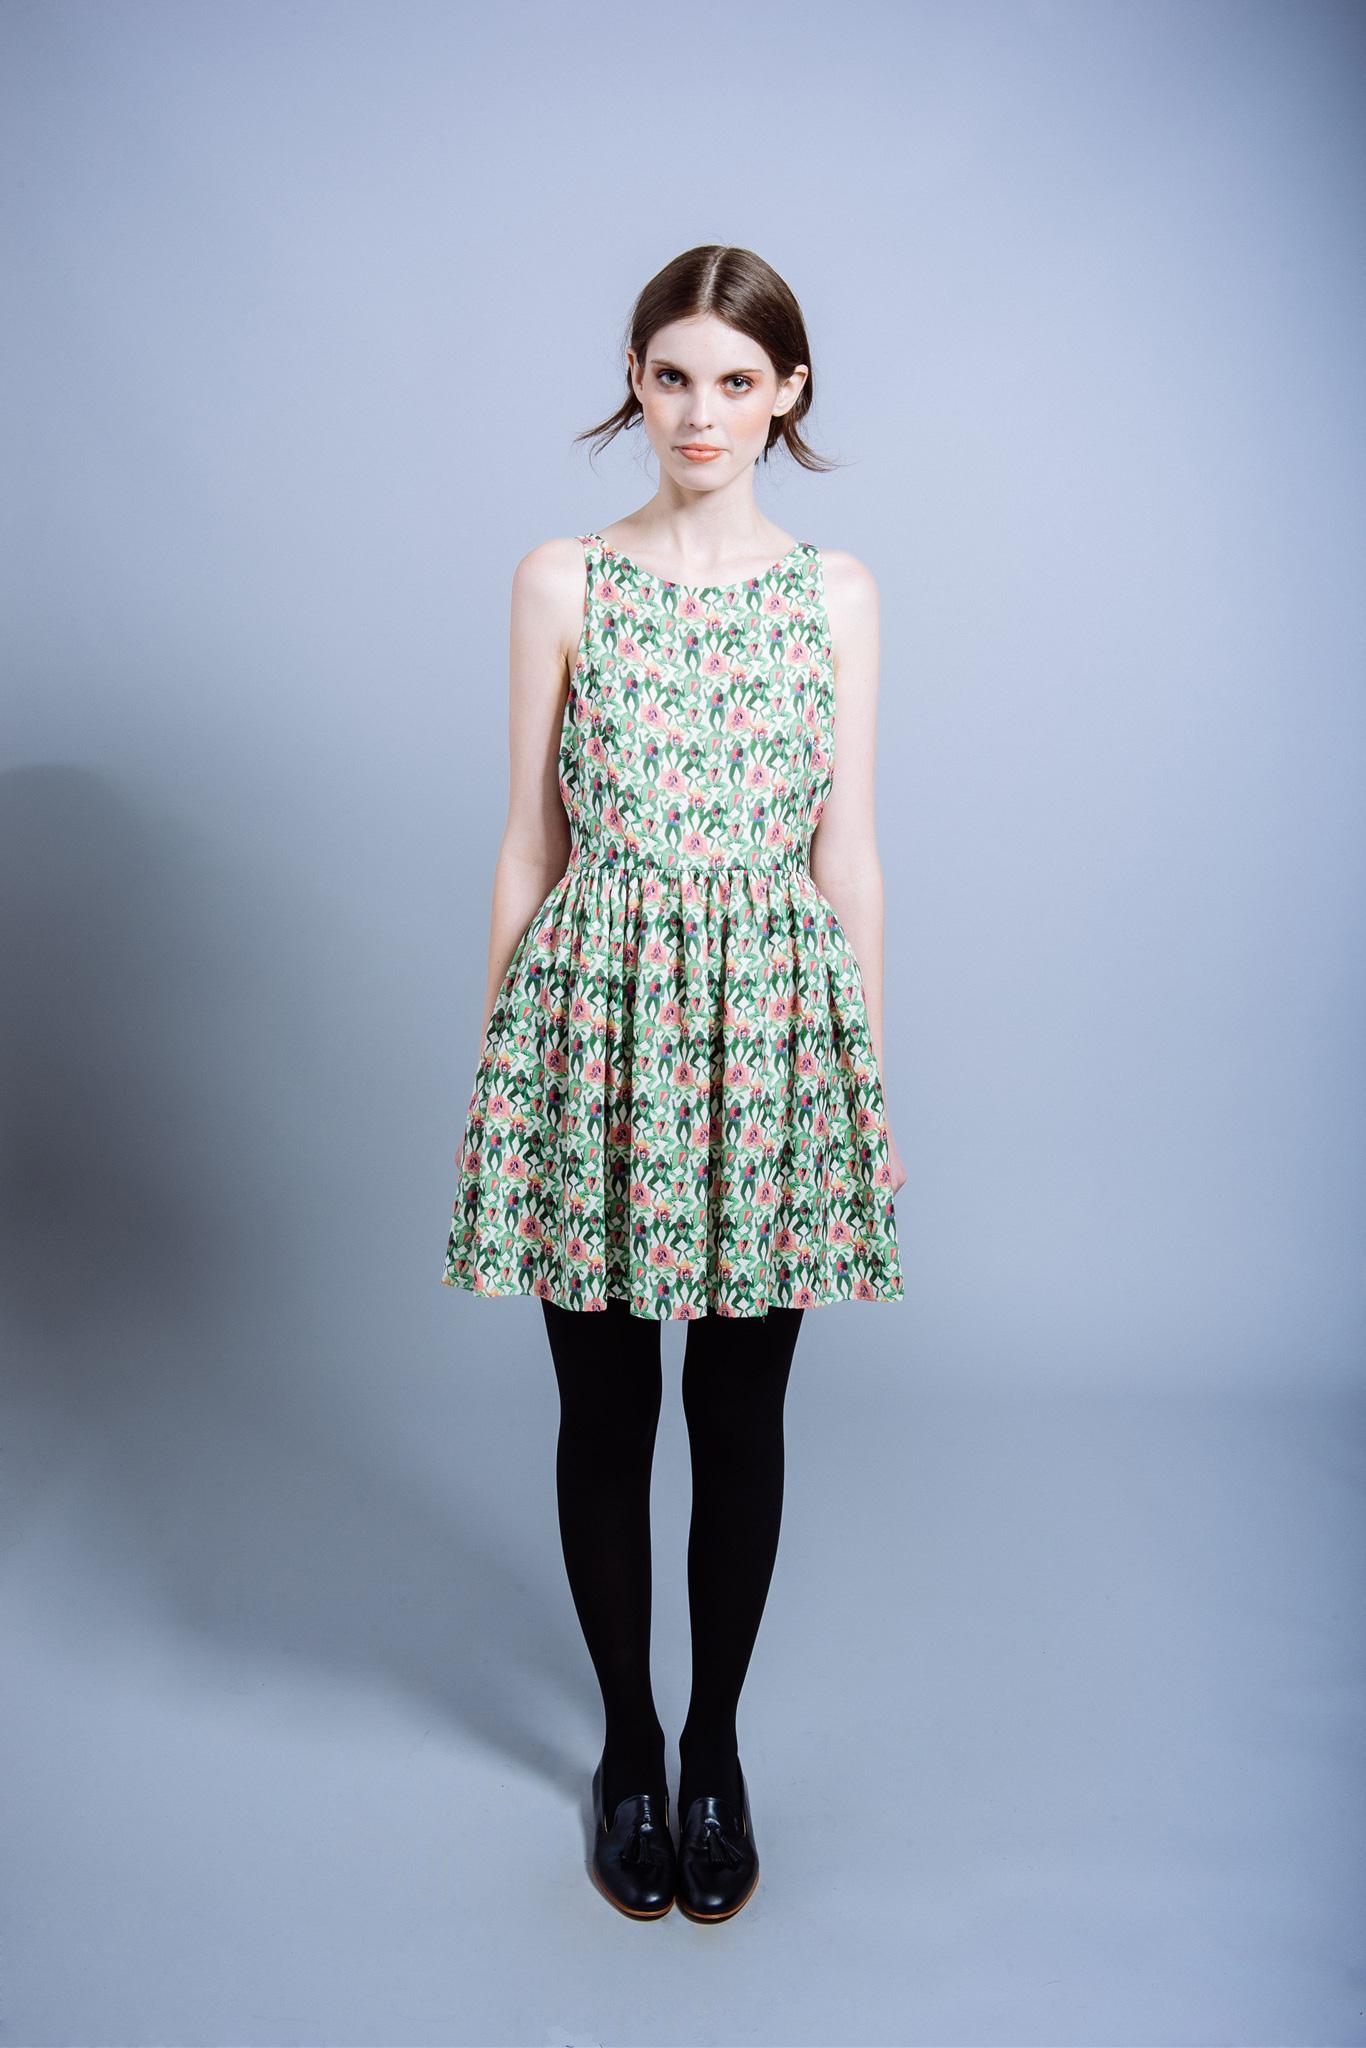 405713d3364f NYFW Fantasy Costuming  Rachel Antonoff Fall 2015 for Girls